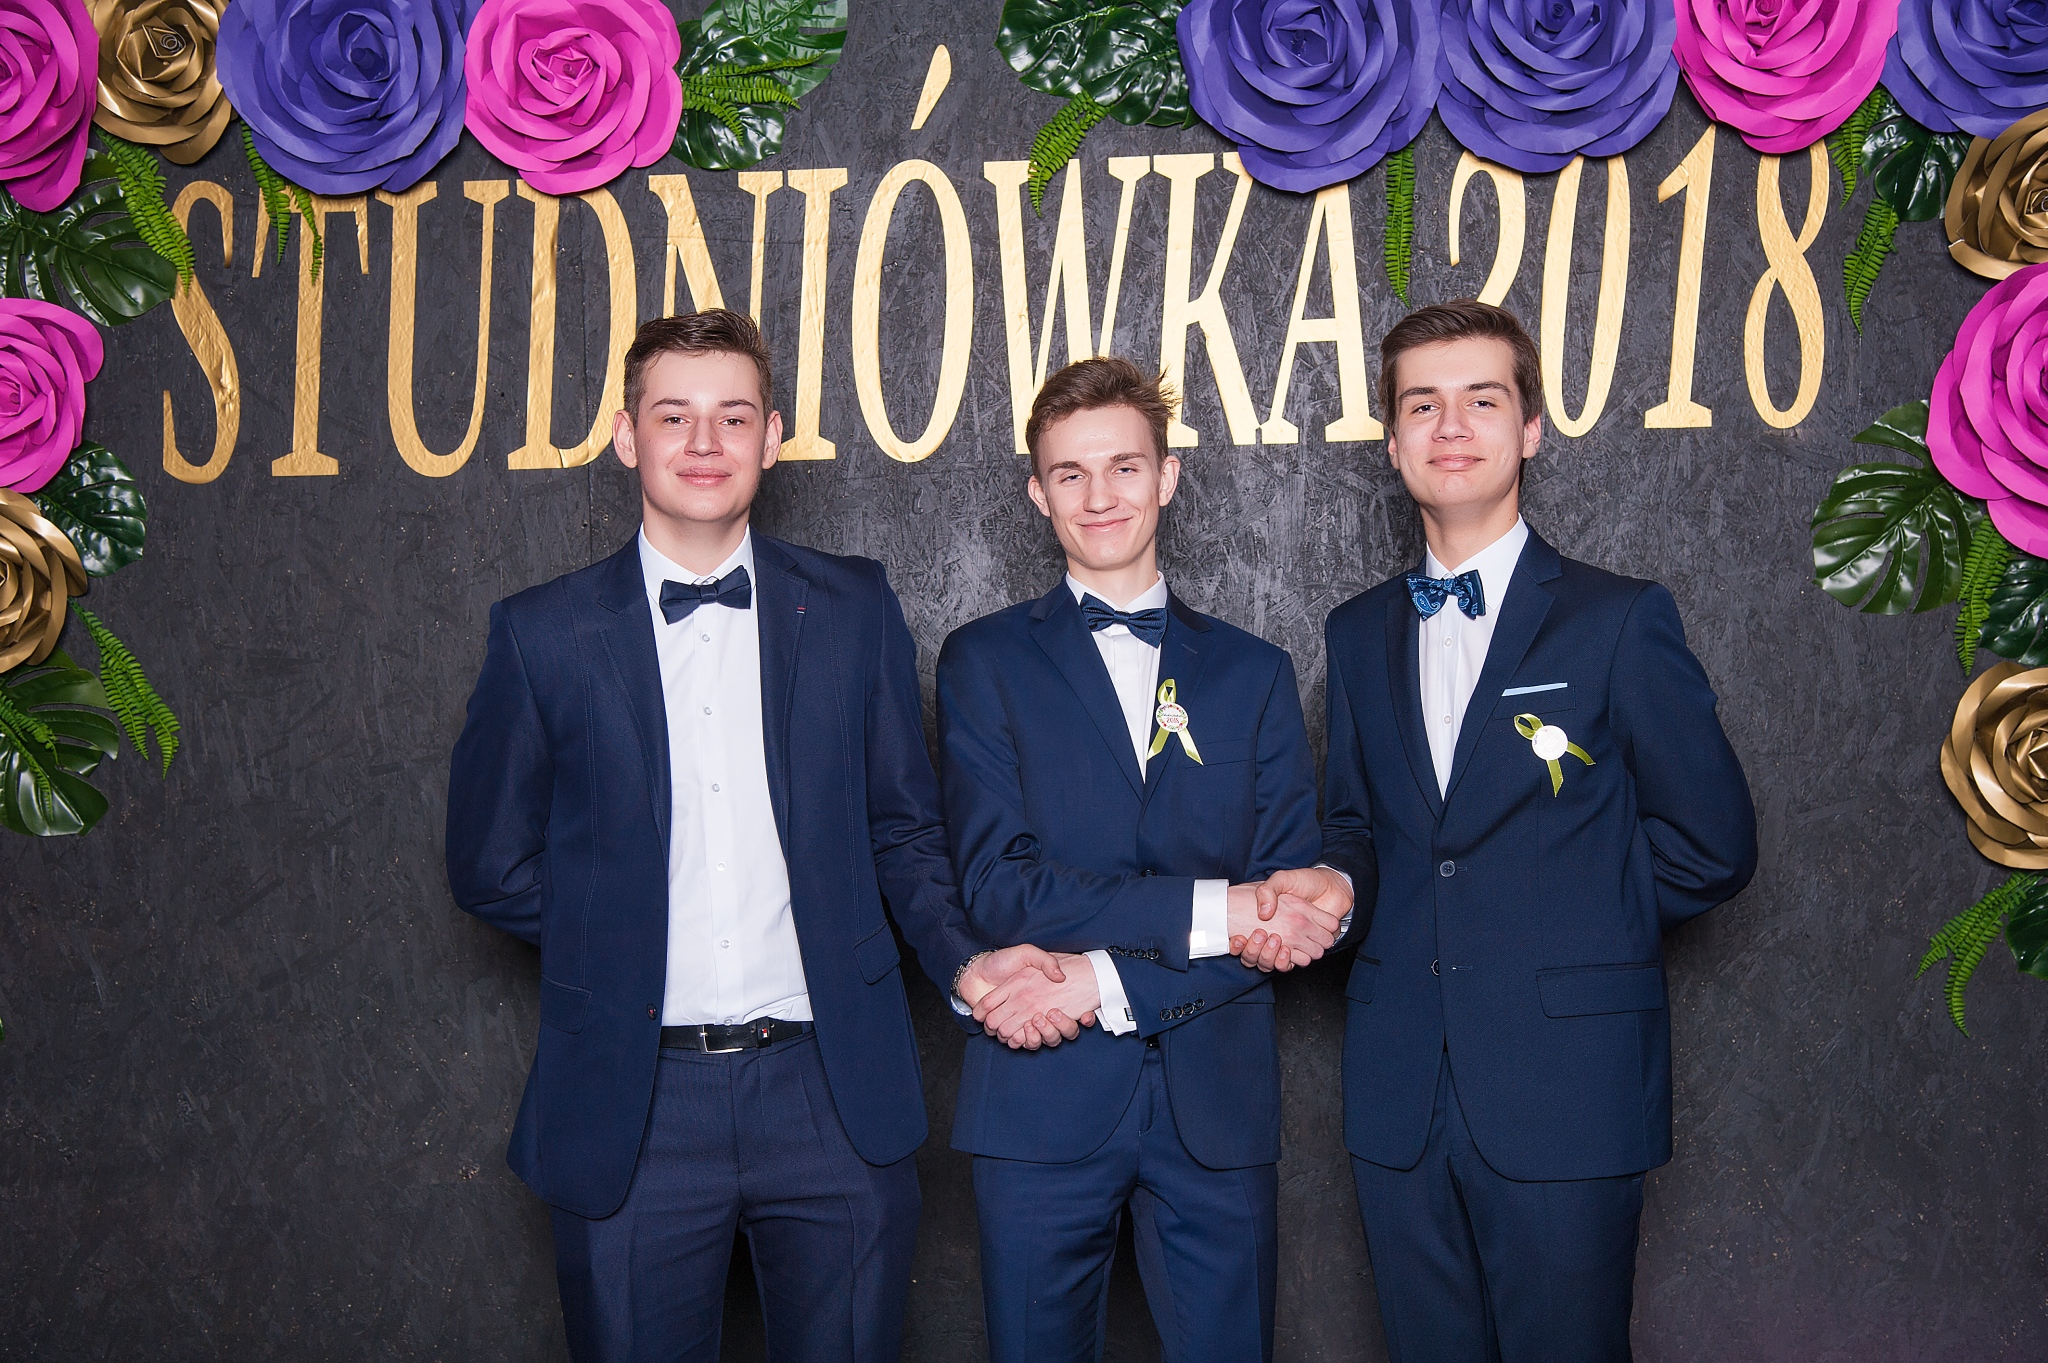 0131_100dniowka_studniowka_kalisz_IIILO_im_kopernika_zdjecia_par_scianka__7297.jpg